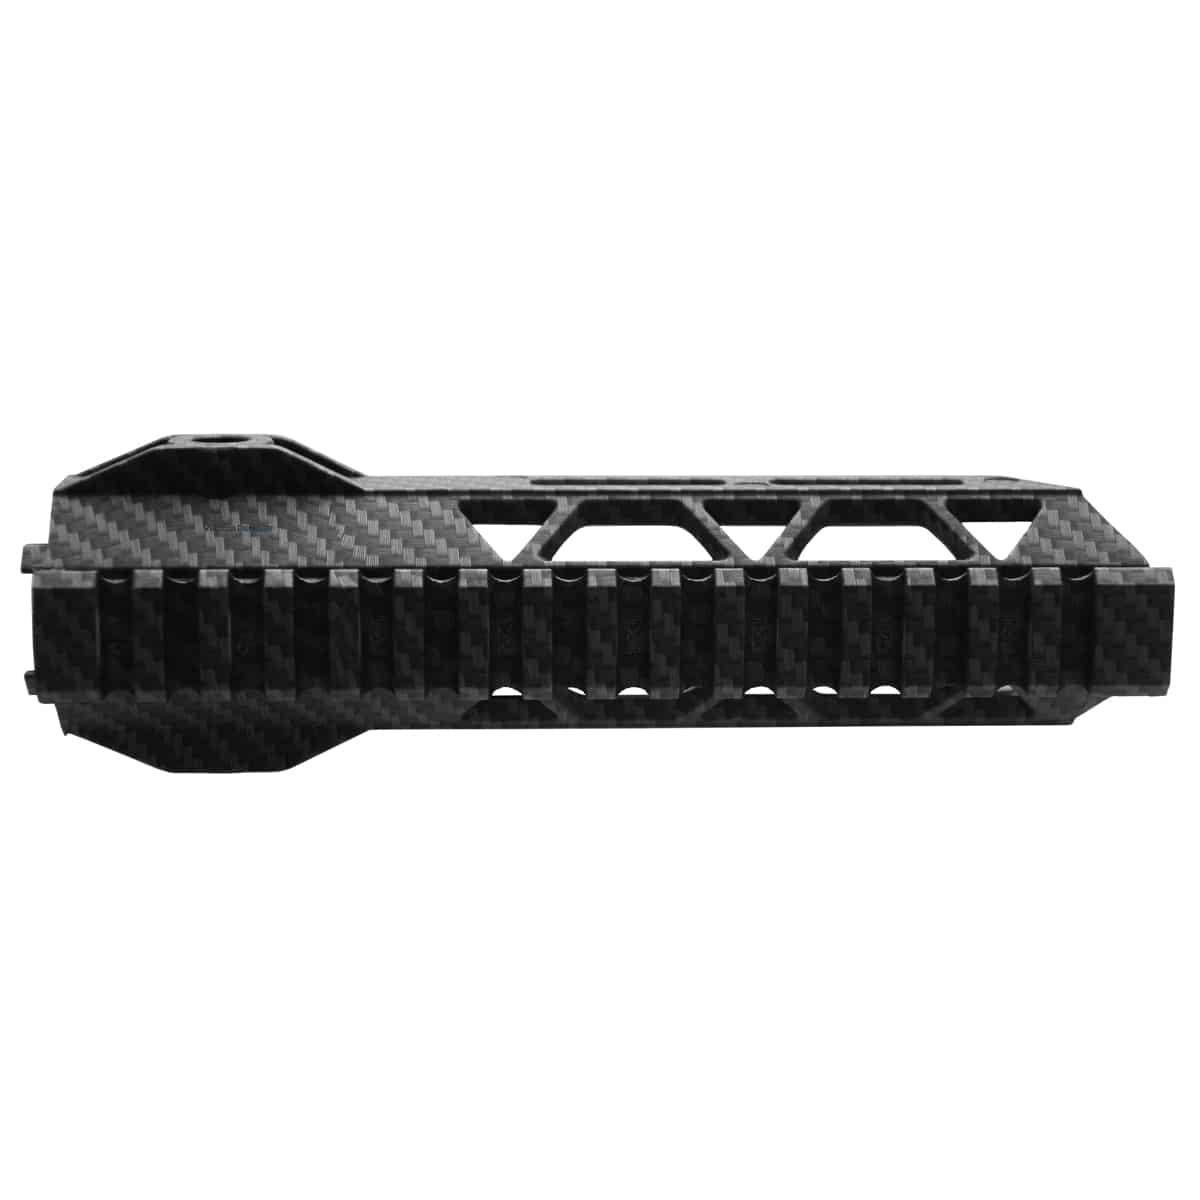 MLOK Carbon Fiber Polymer 7